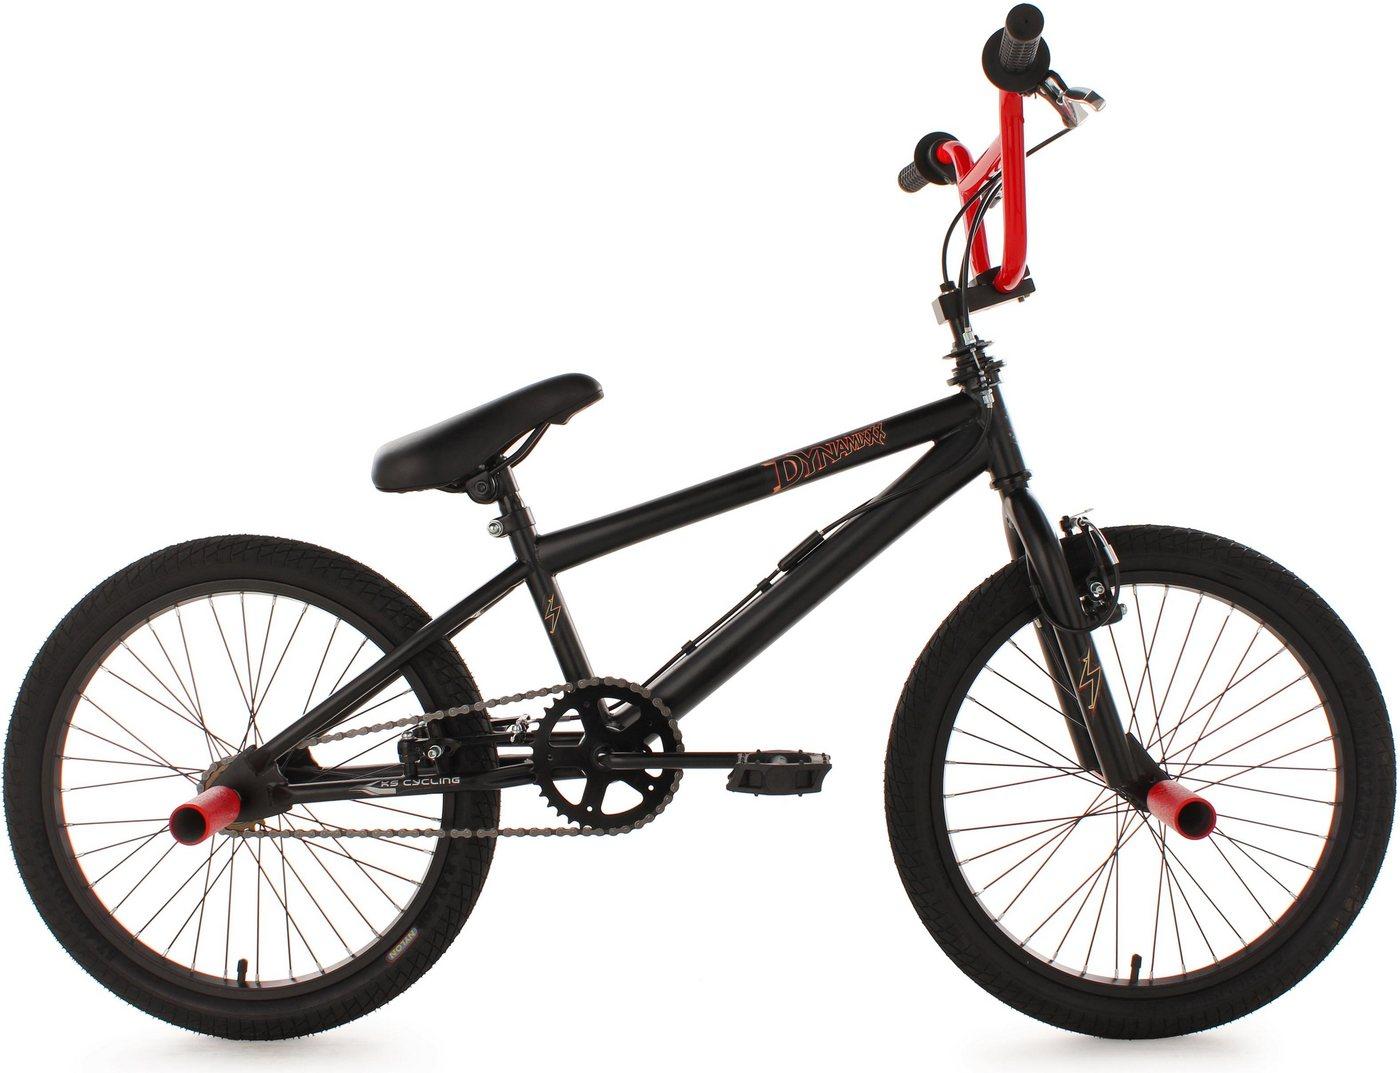 Image of BMX-Fahrrad Dynamixxx 20 Zoll, rot schwarz